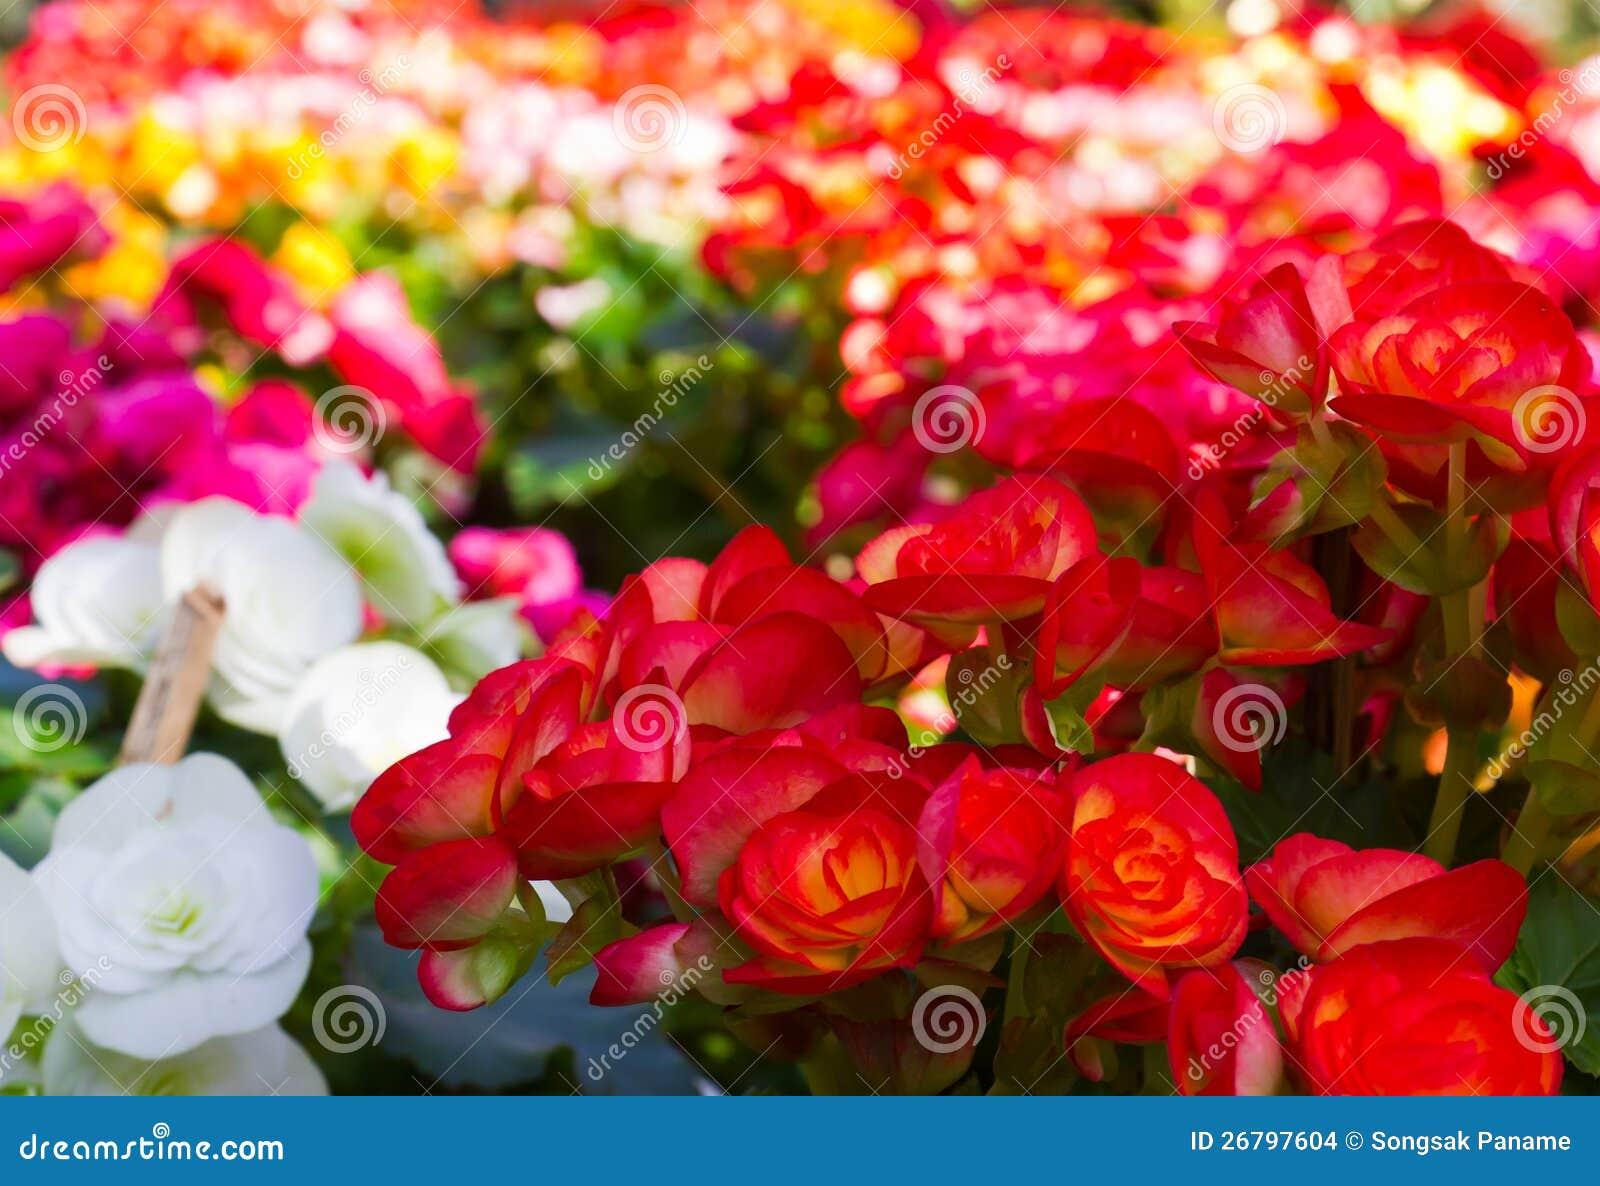 Beautiful Flower Garden Stock Photo Image Of Head Impatiens 26797604